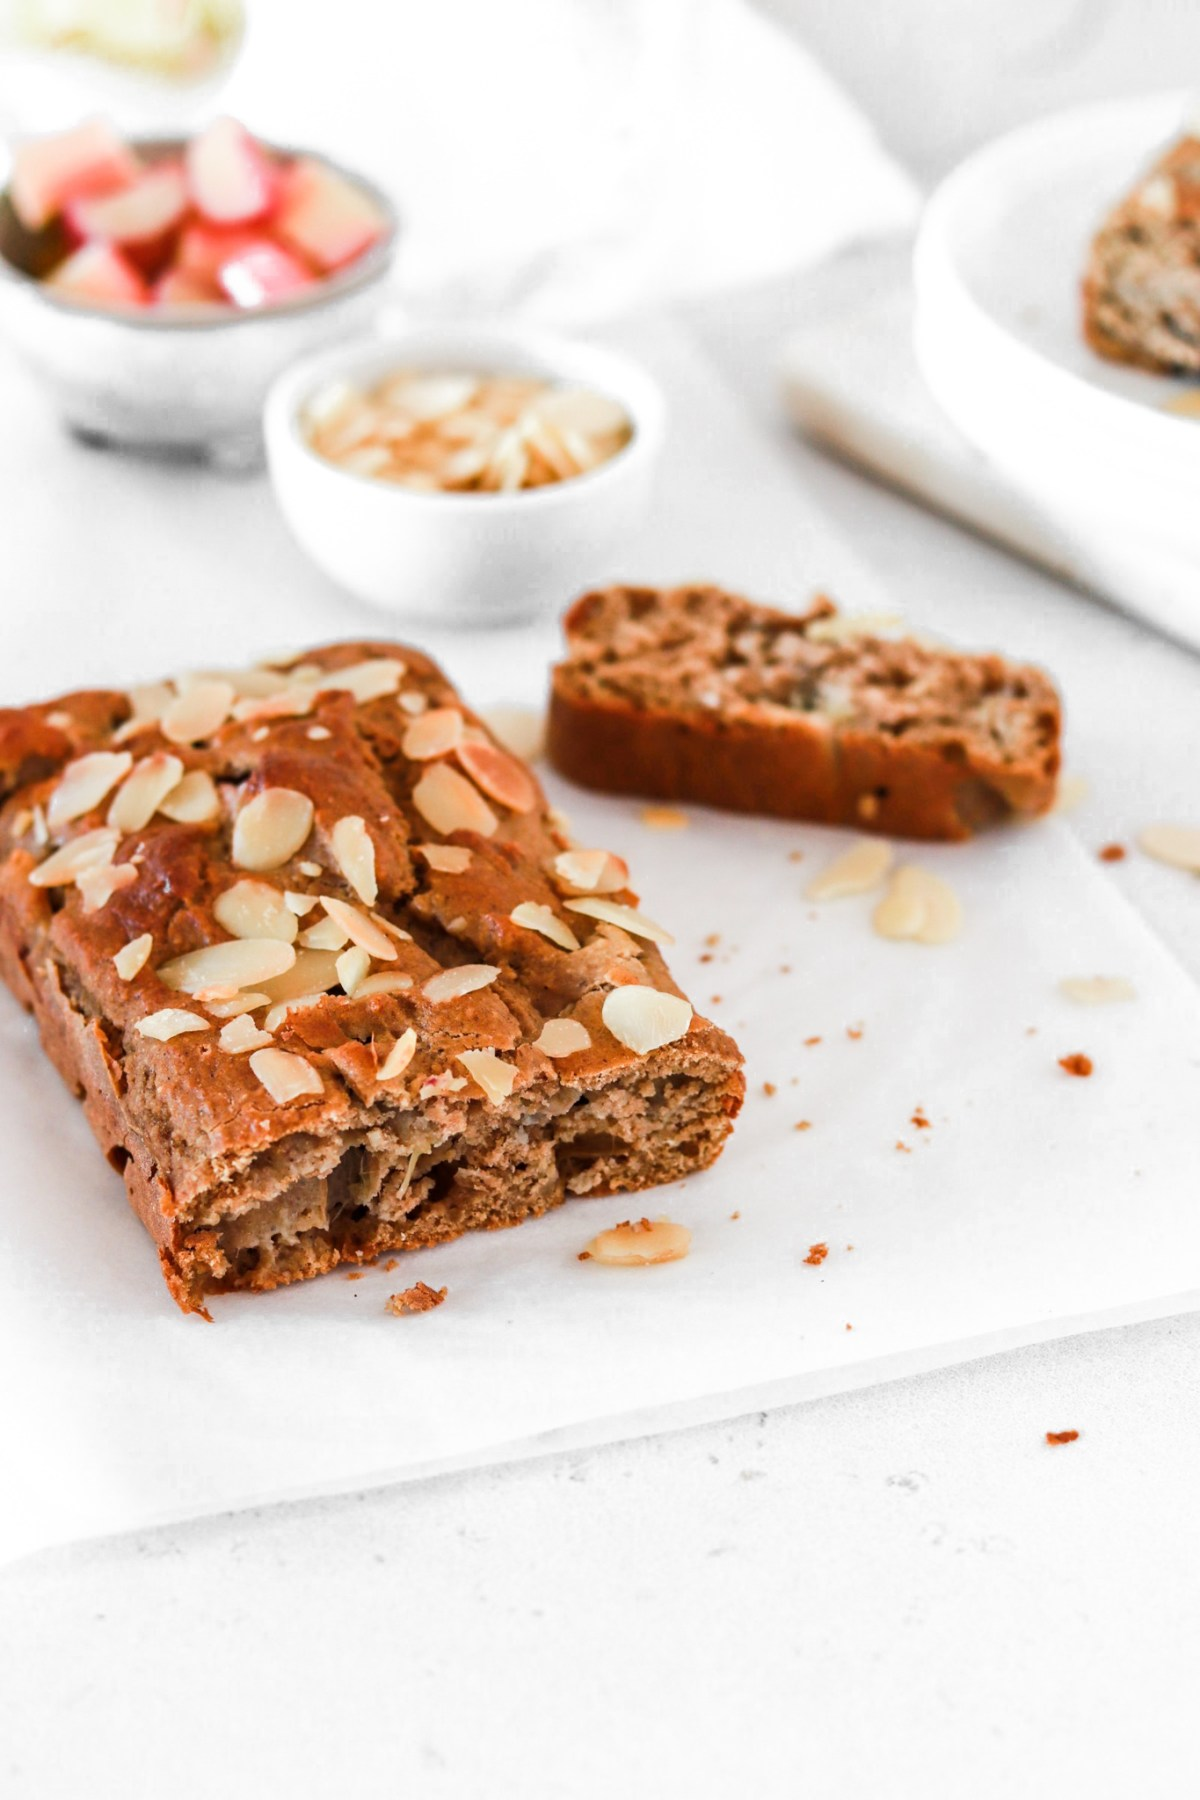 Rhubarb & Cardamom Cake (Gluten, Sugar & Oil Free) Inside From Front